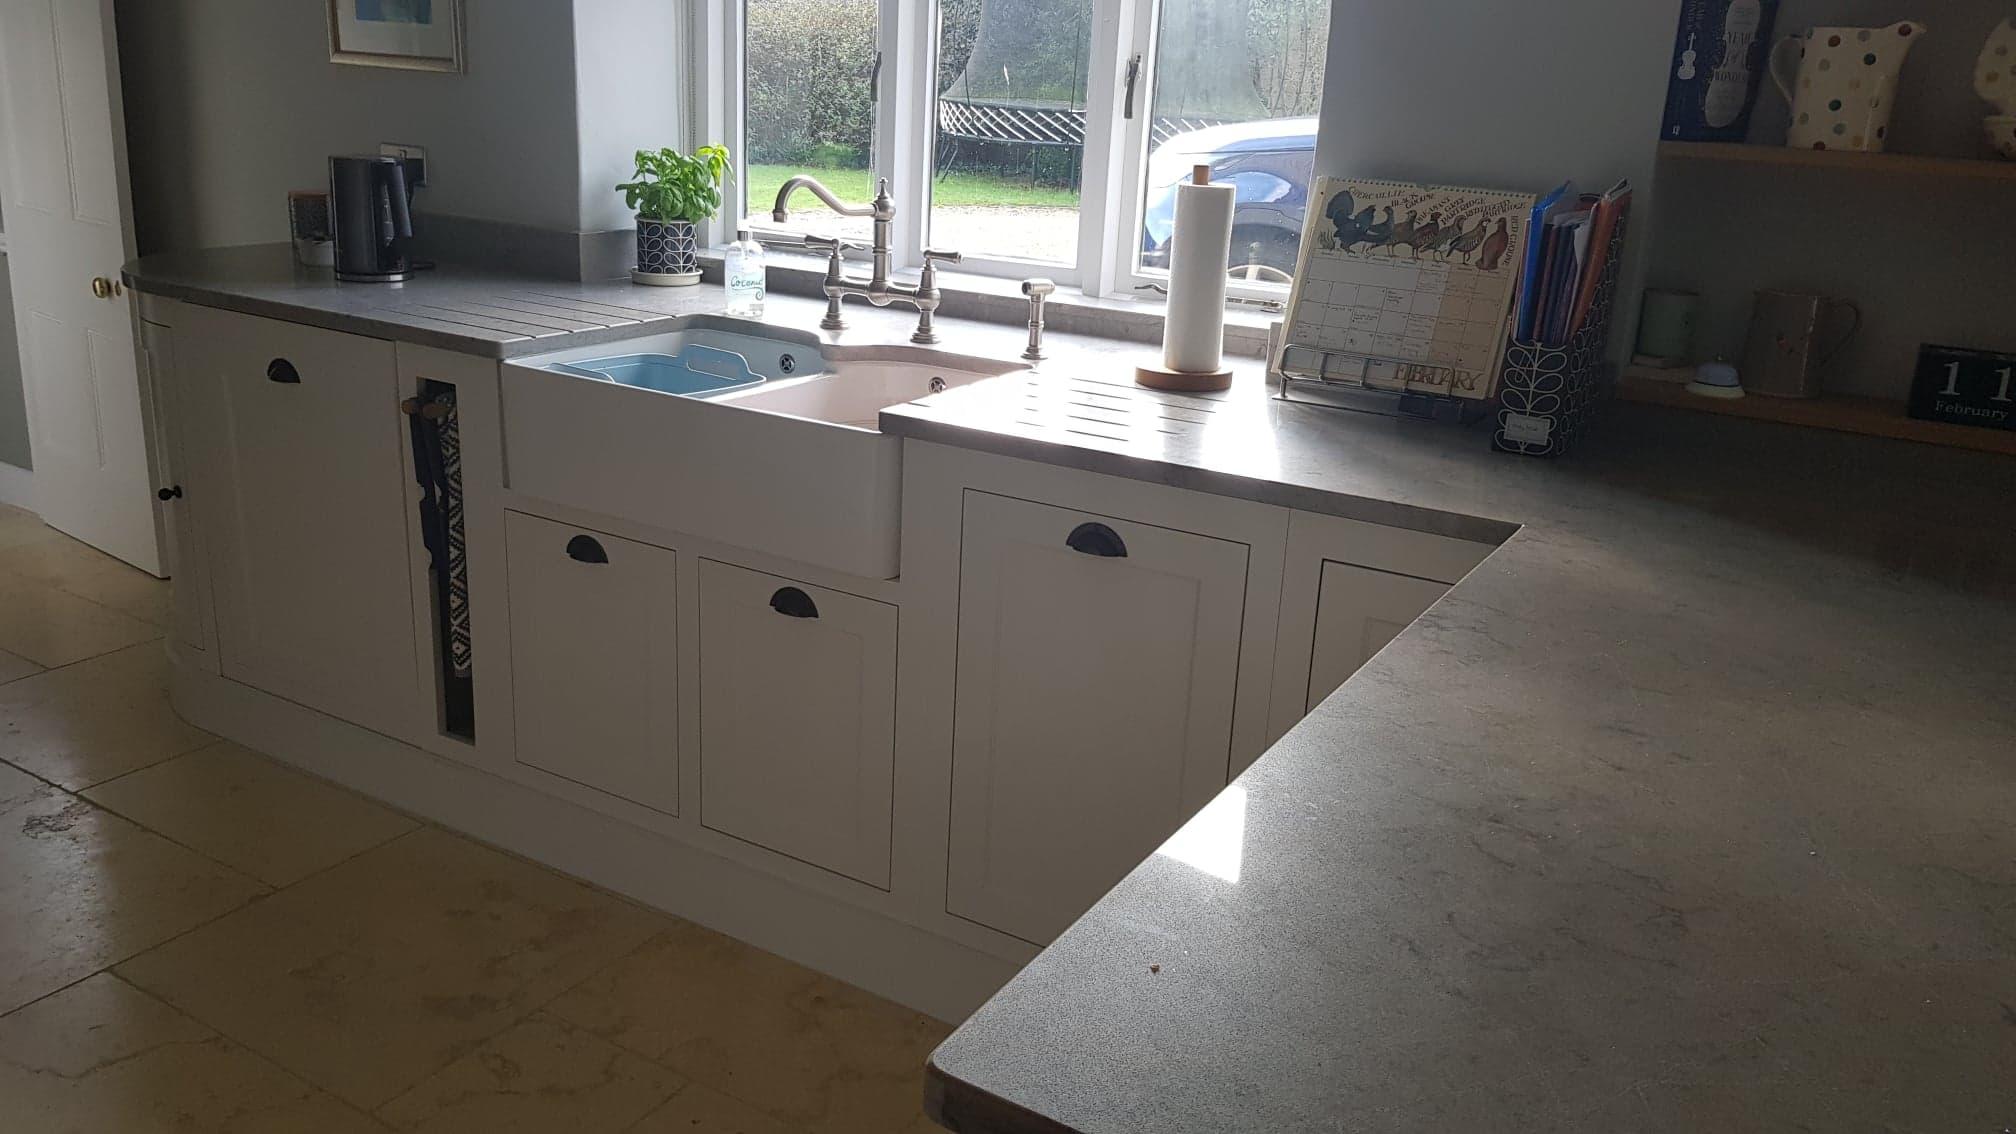 Henley painted kitchen by Robert James Interiors (2).jpg